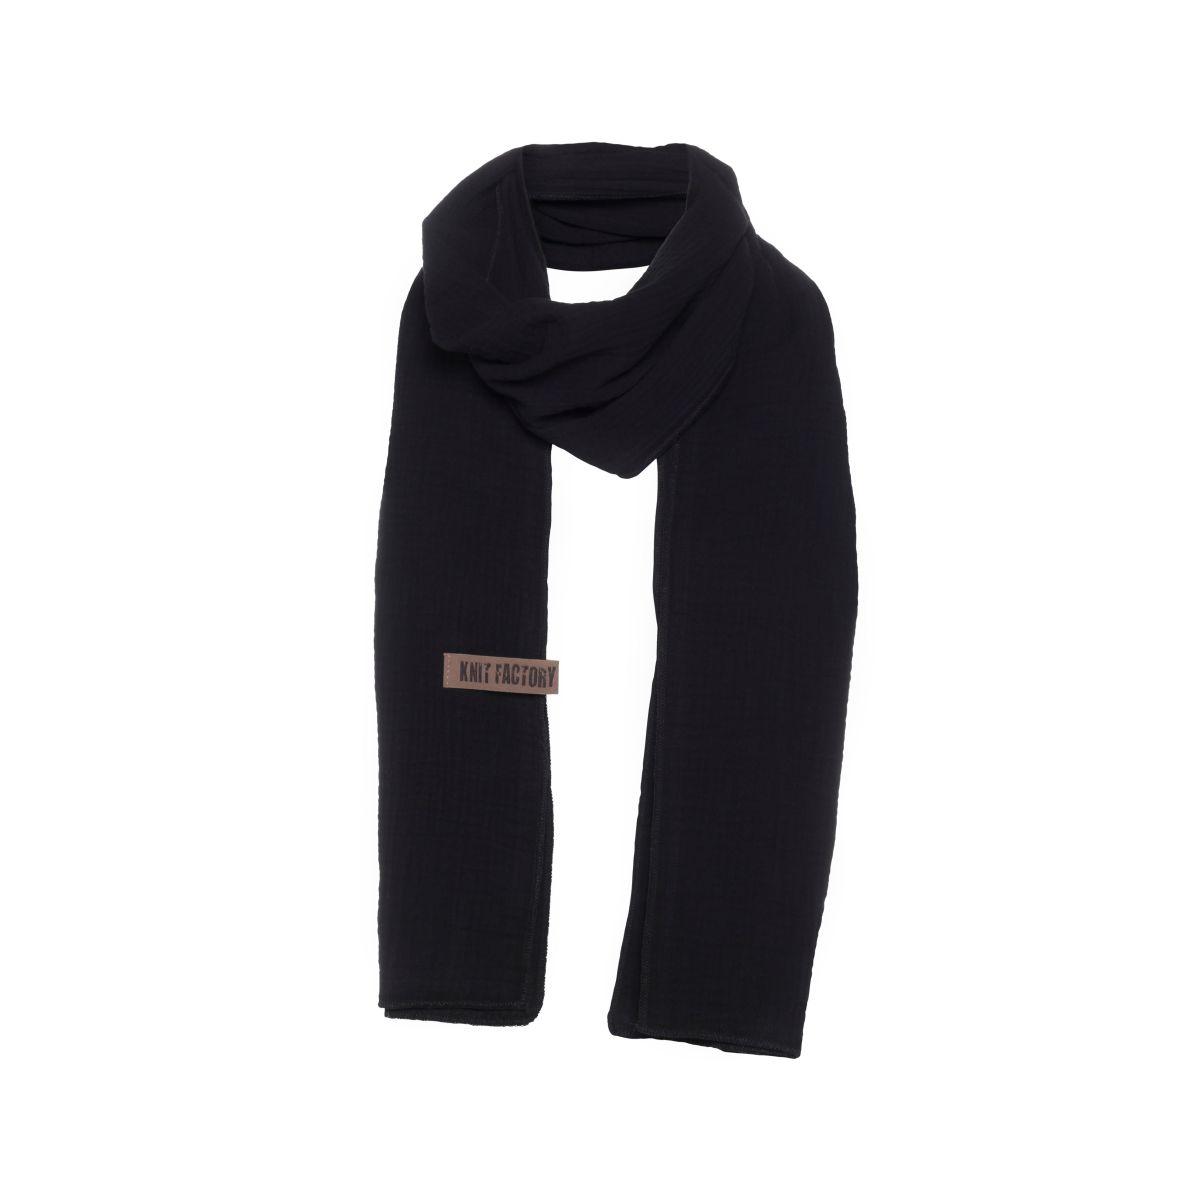 liv scarf black